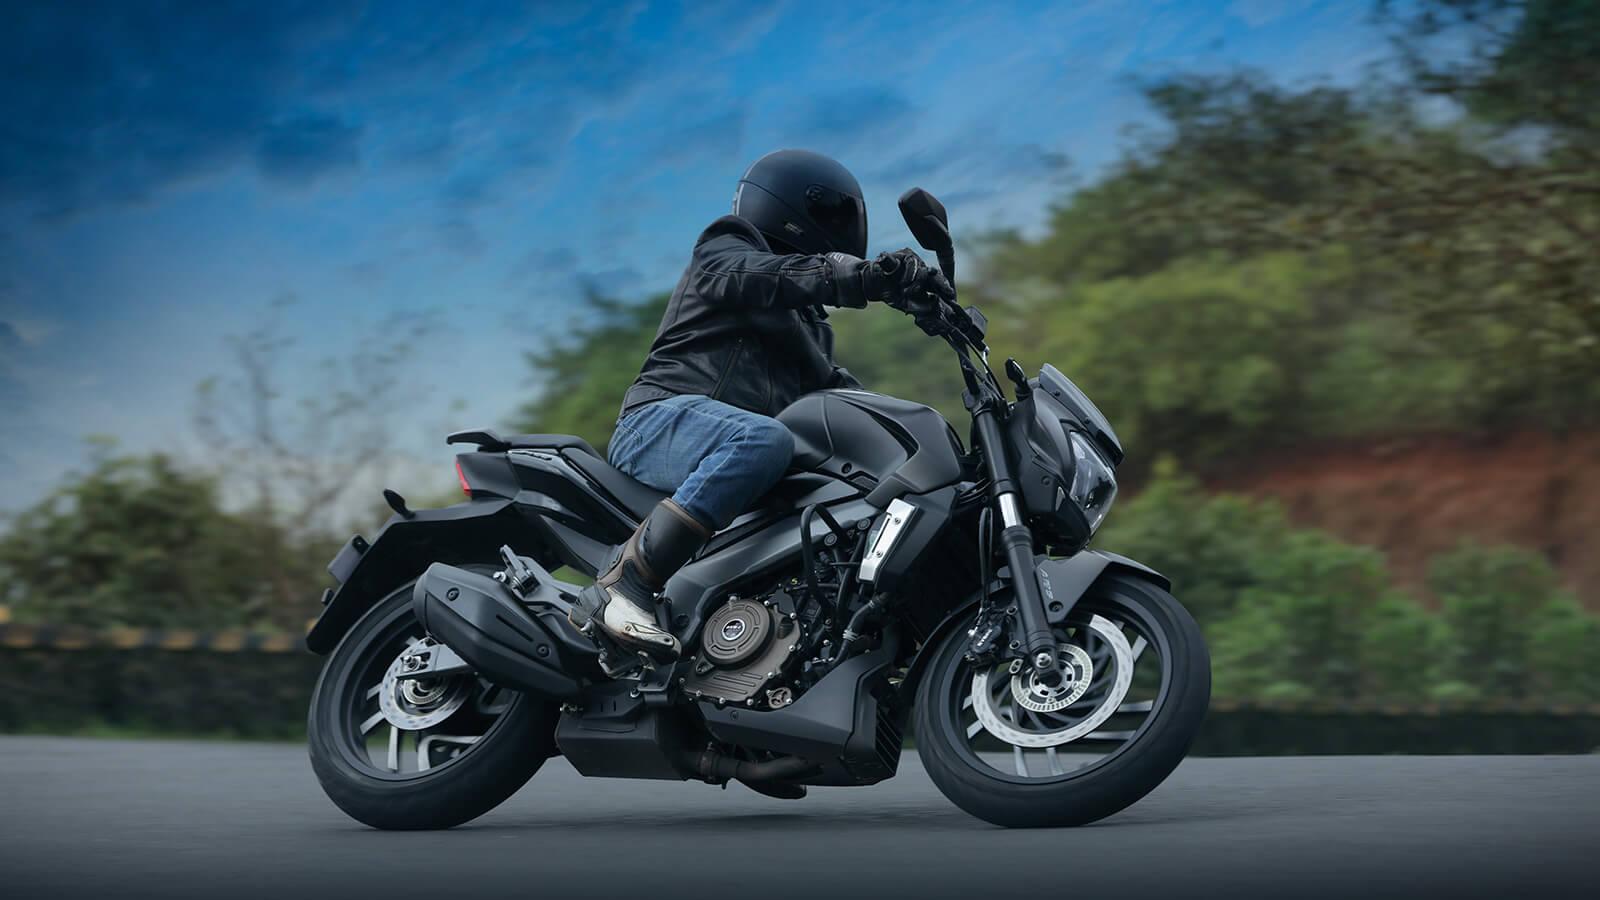 City To City Mileage >> Bajaj Dominar 400 Price, Launch Date, Mileage, Specs, Reviews - Bajaj Auto